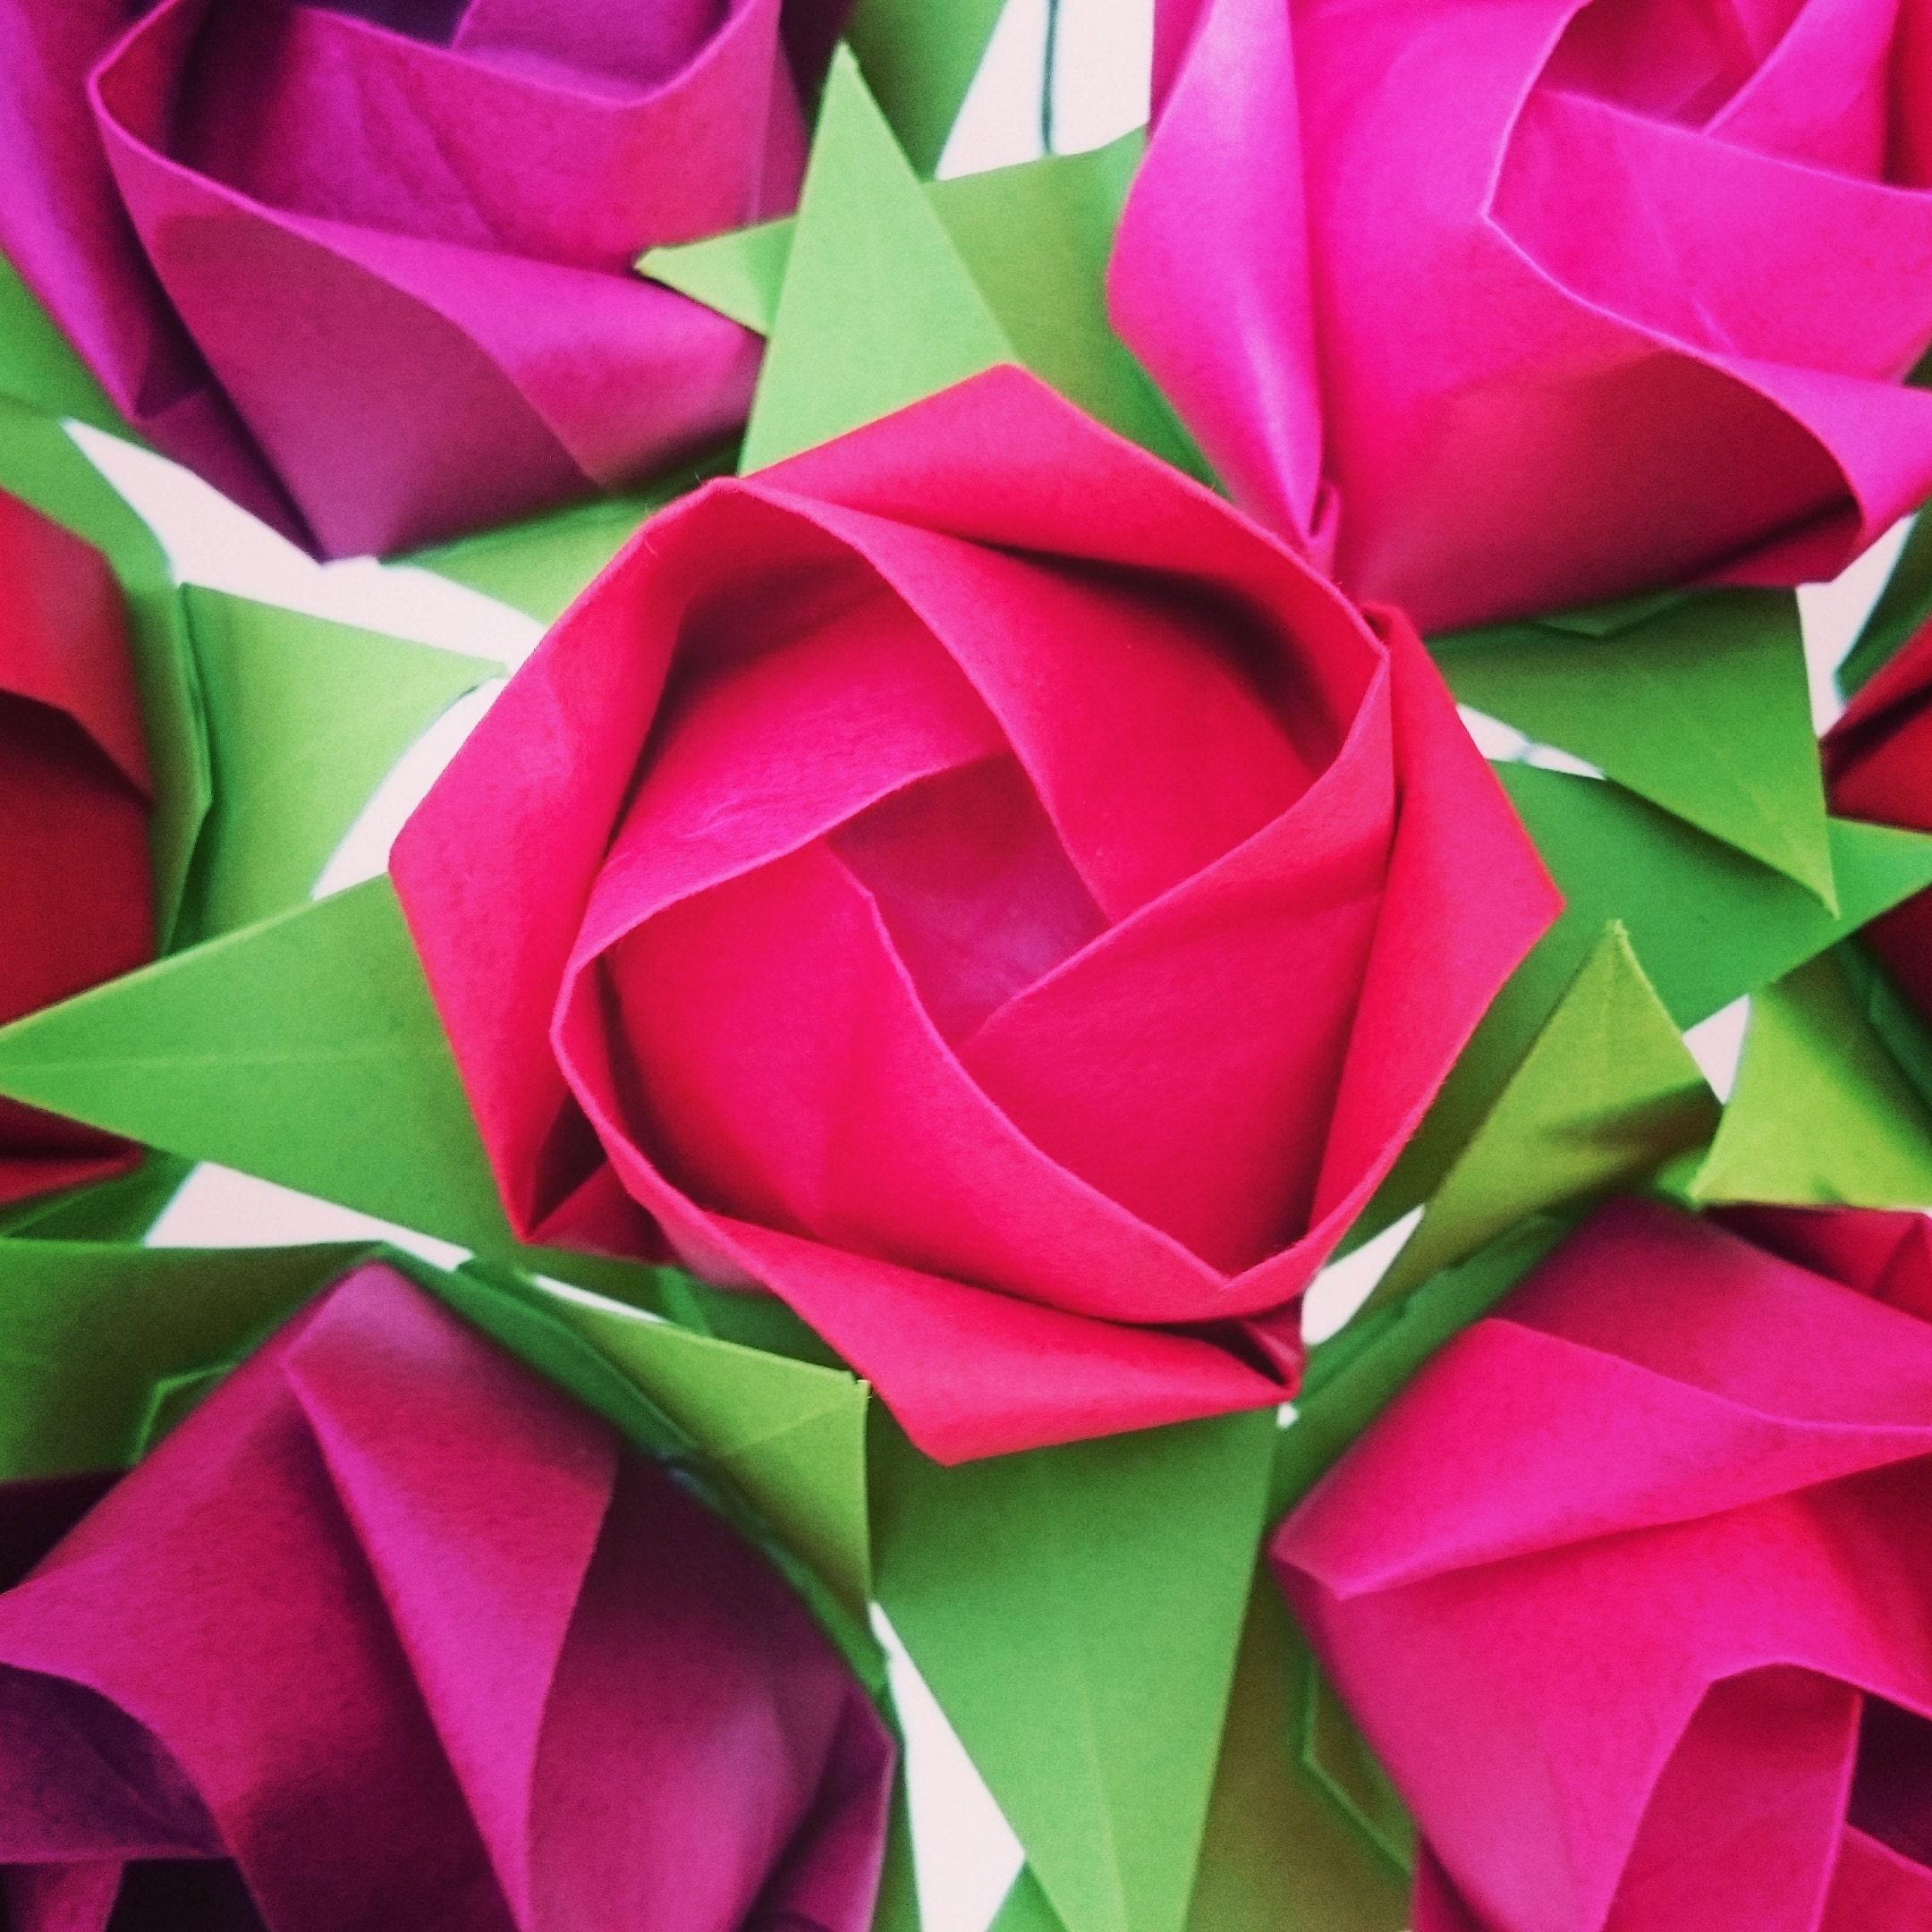 Boho Gift Flowers Origami Paper Flowers Bouquet Alternative Etsy